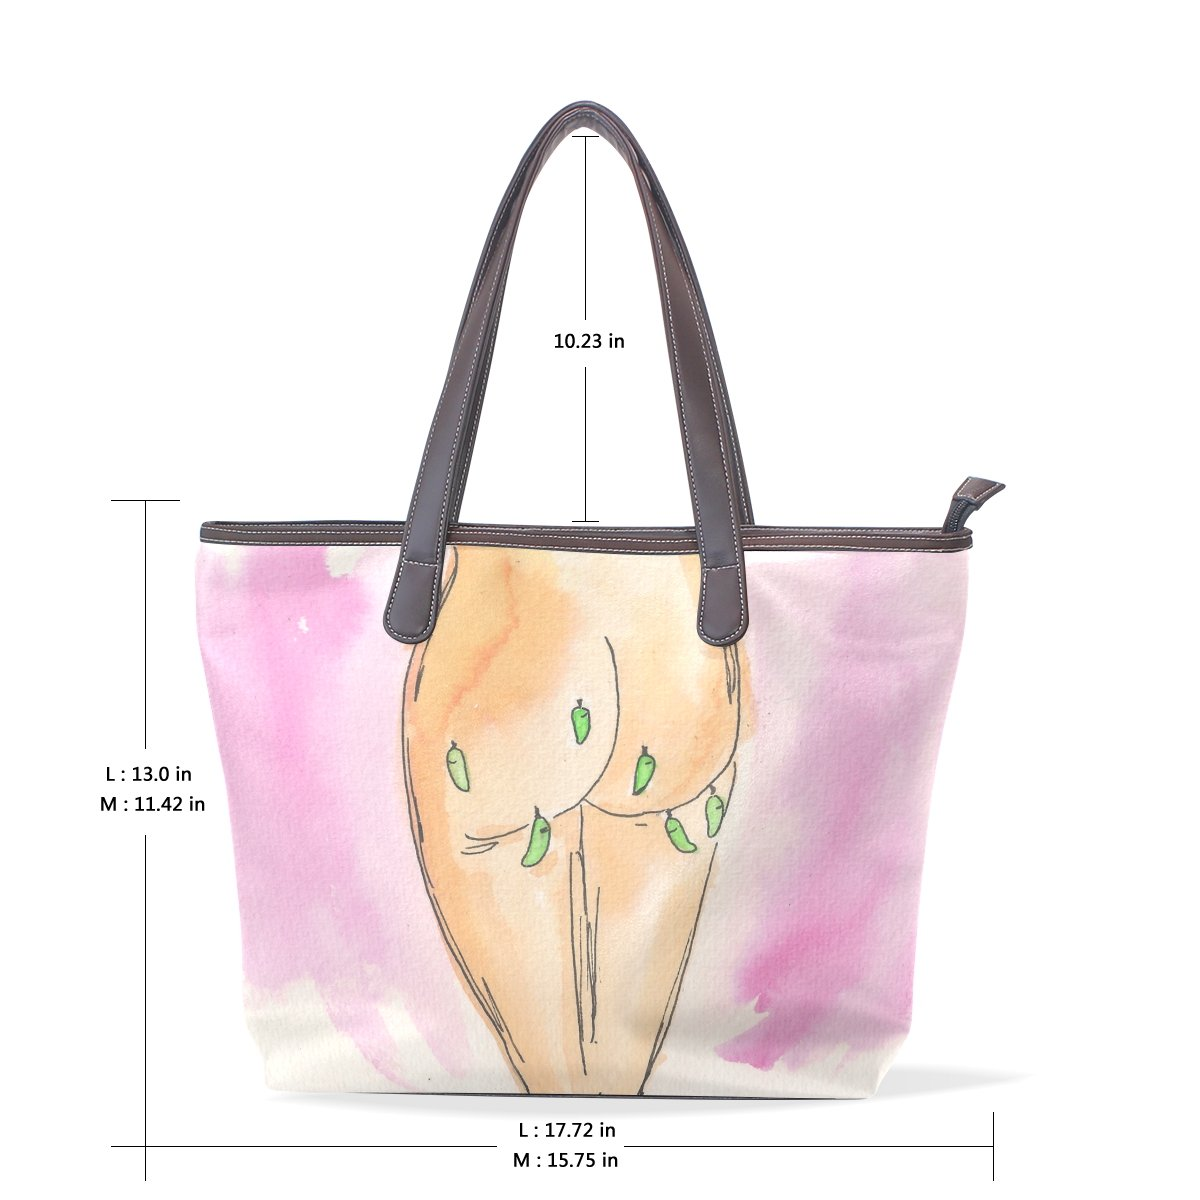 Mr.Weng Household Chrysalis Bum Lady Handbag Tote Bag Zipper Shoulder Bag